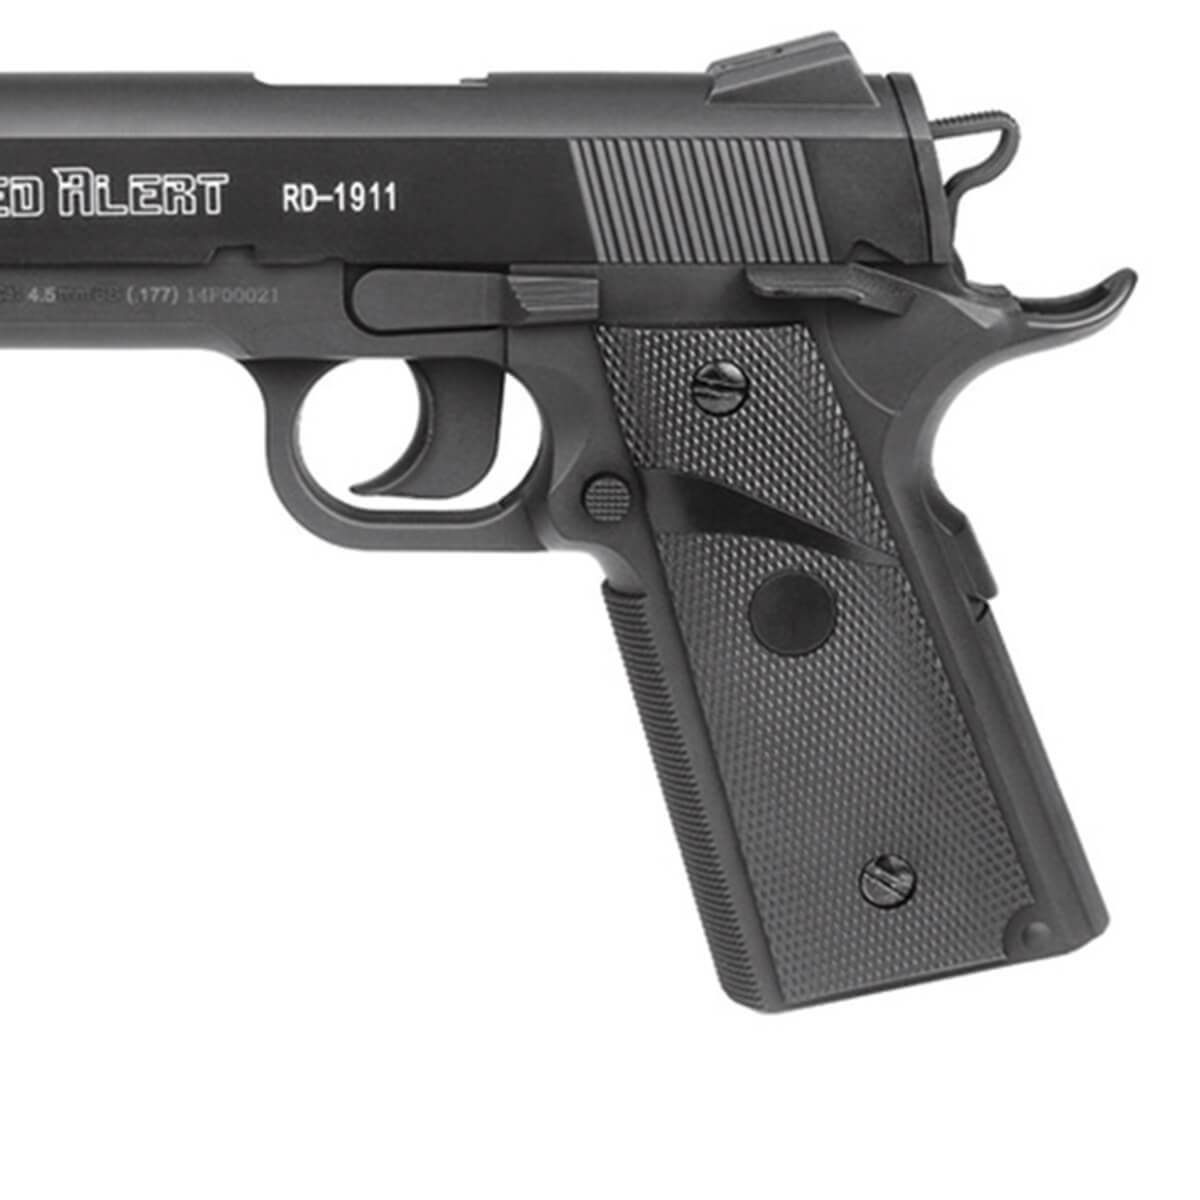 Pistola de Pressão Gamo Red Alert RD-1911 4,5mm Co2